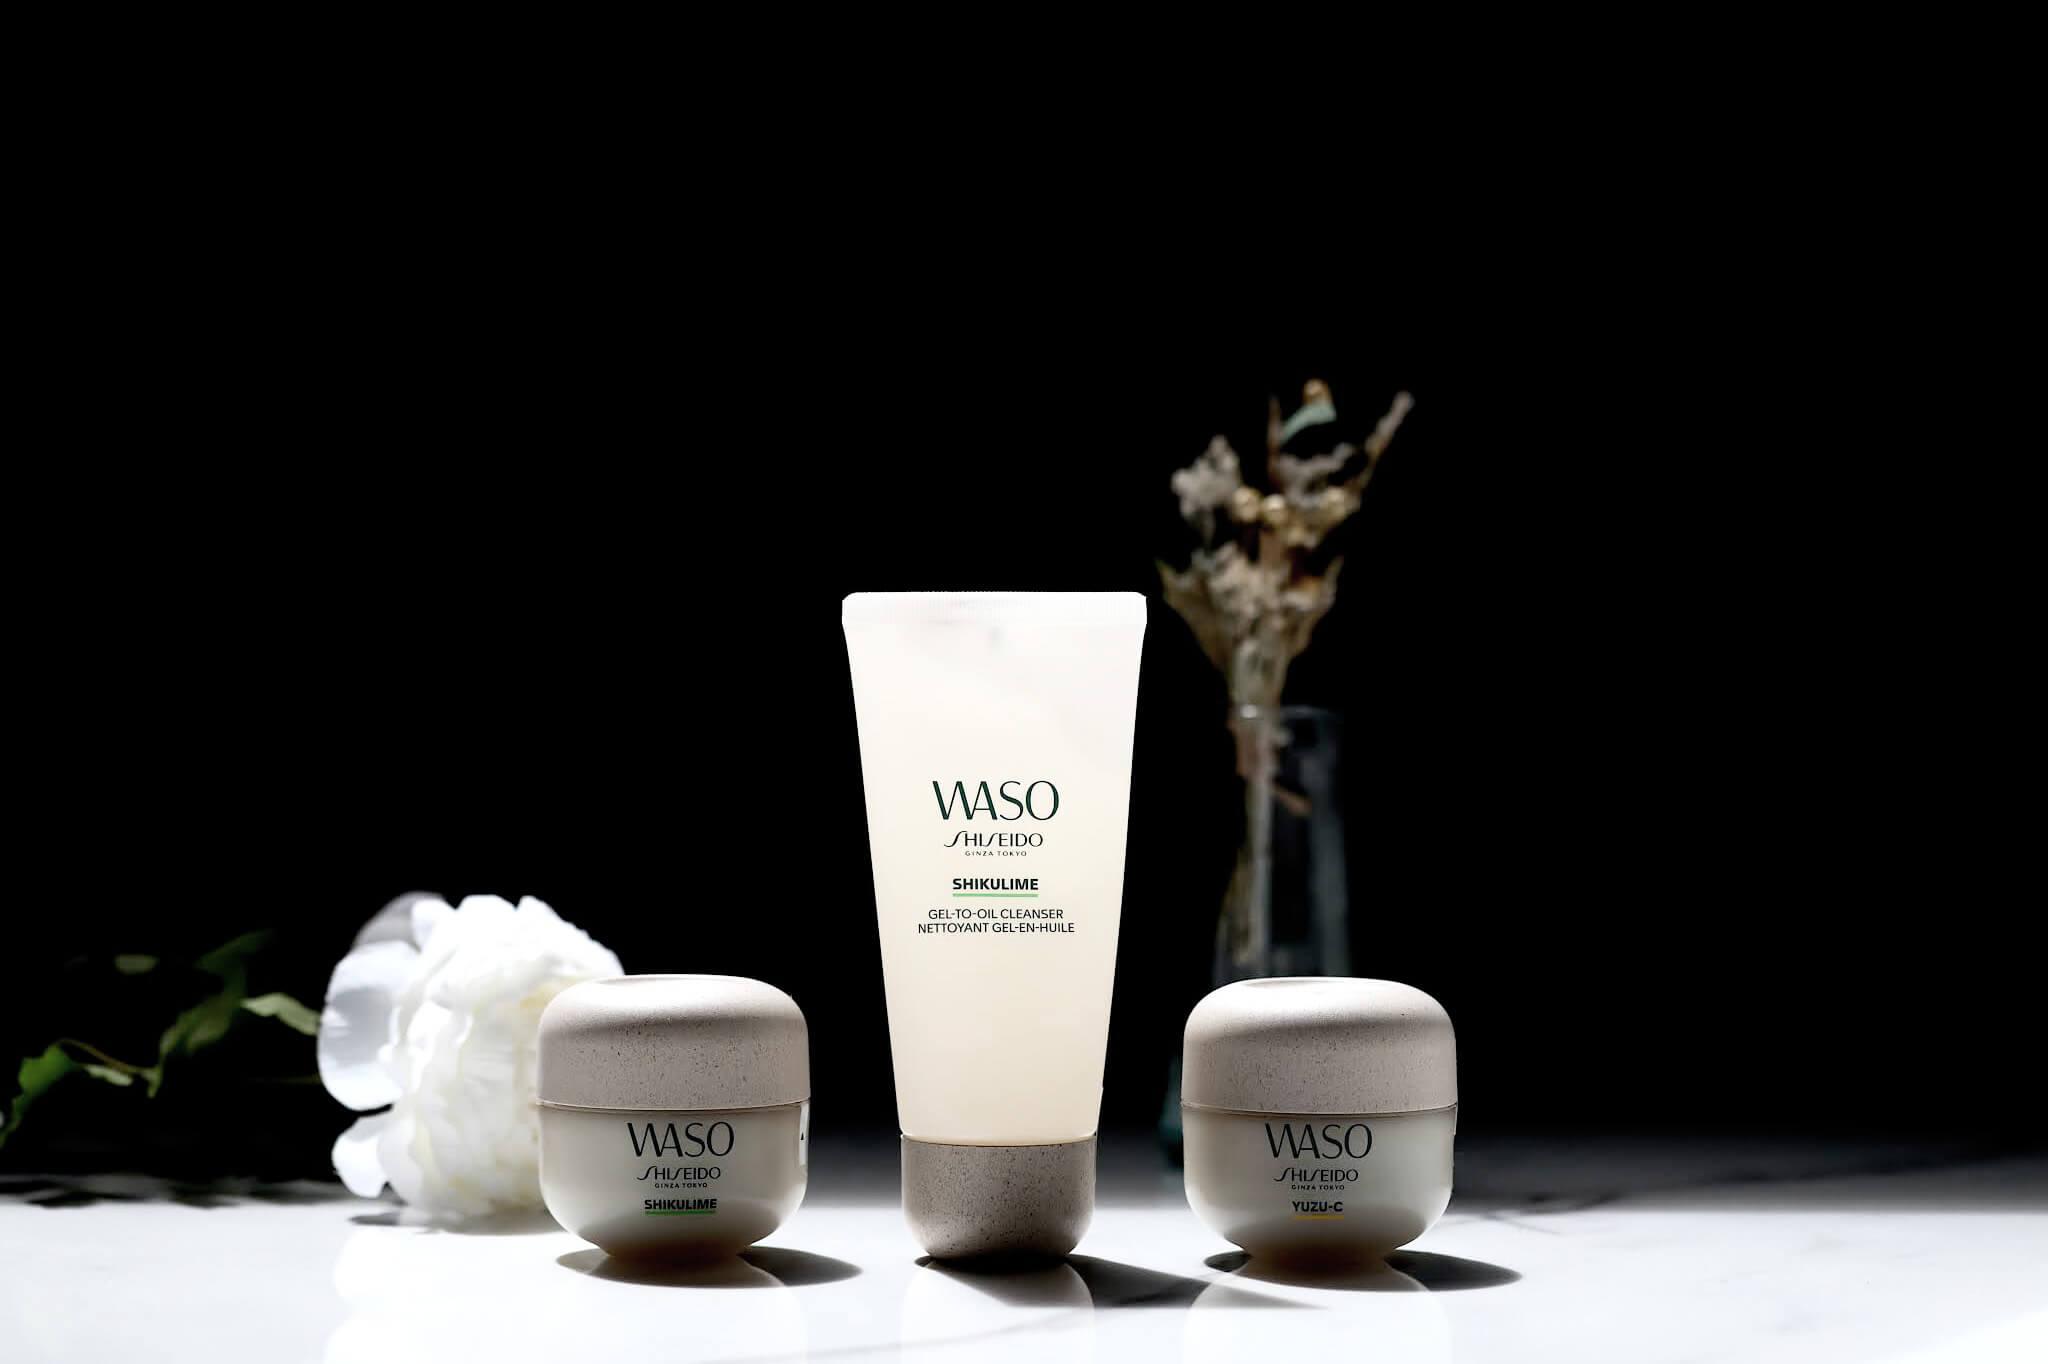 shiseido waso soins visage